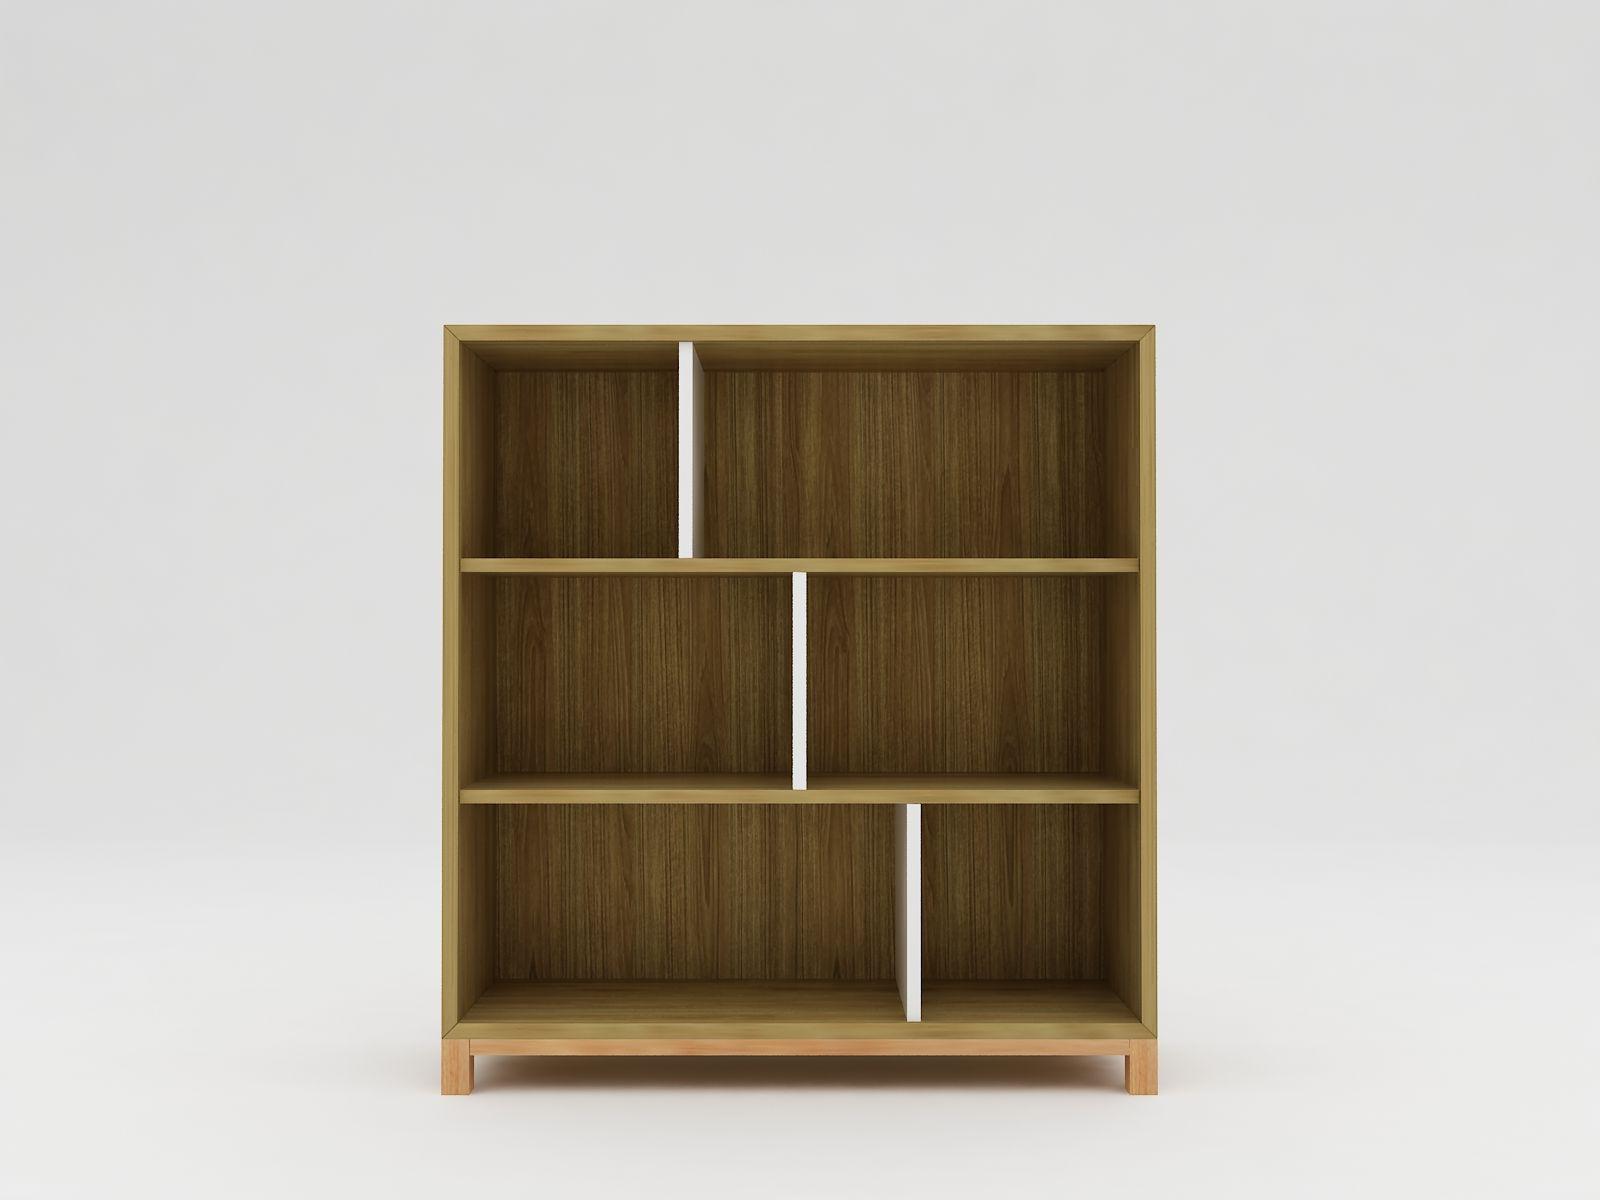 Minimalist modern furniture Rak Kayu Minimalis White Elegant Teak